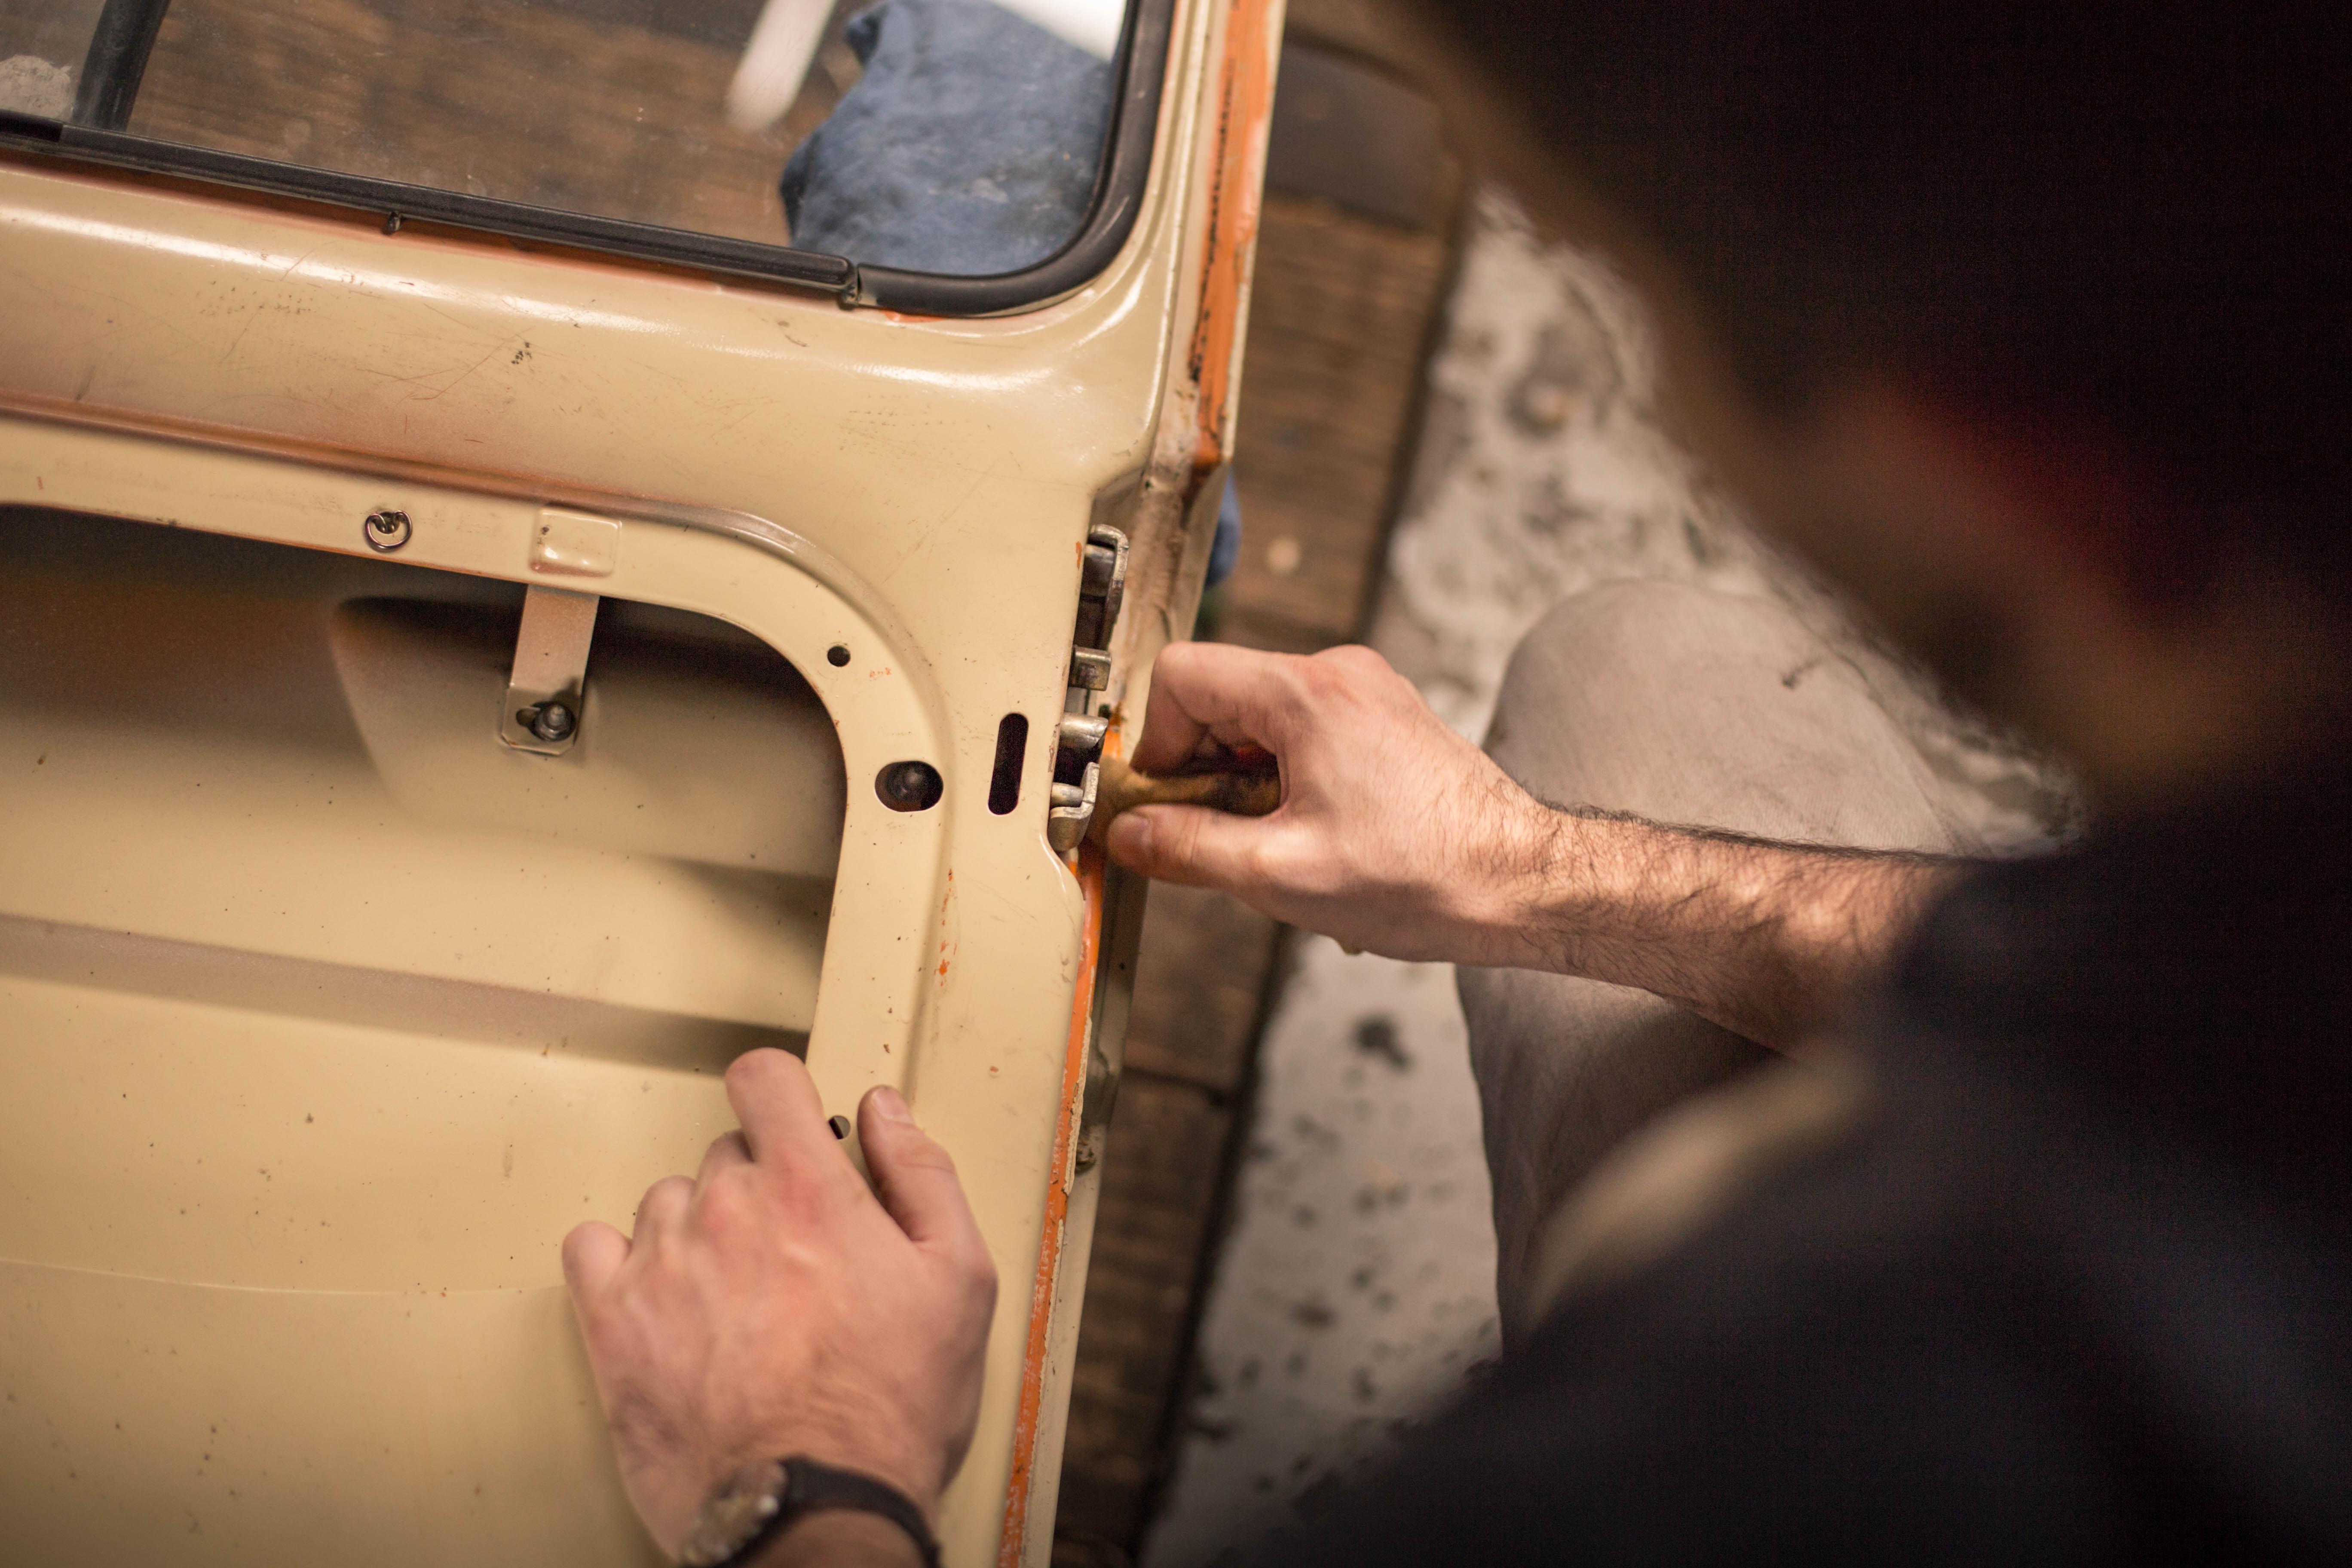 A man adjusting the lock mechanism on a car door